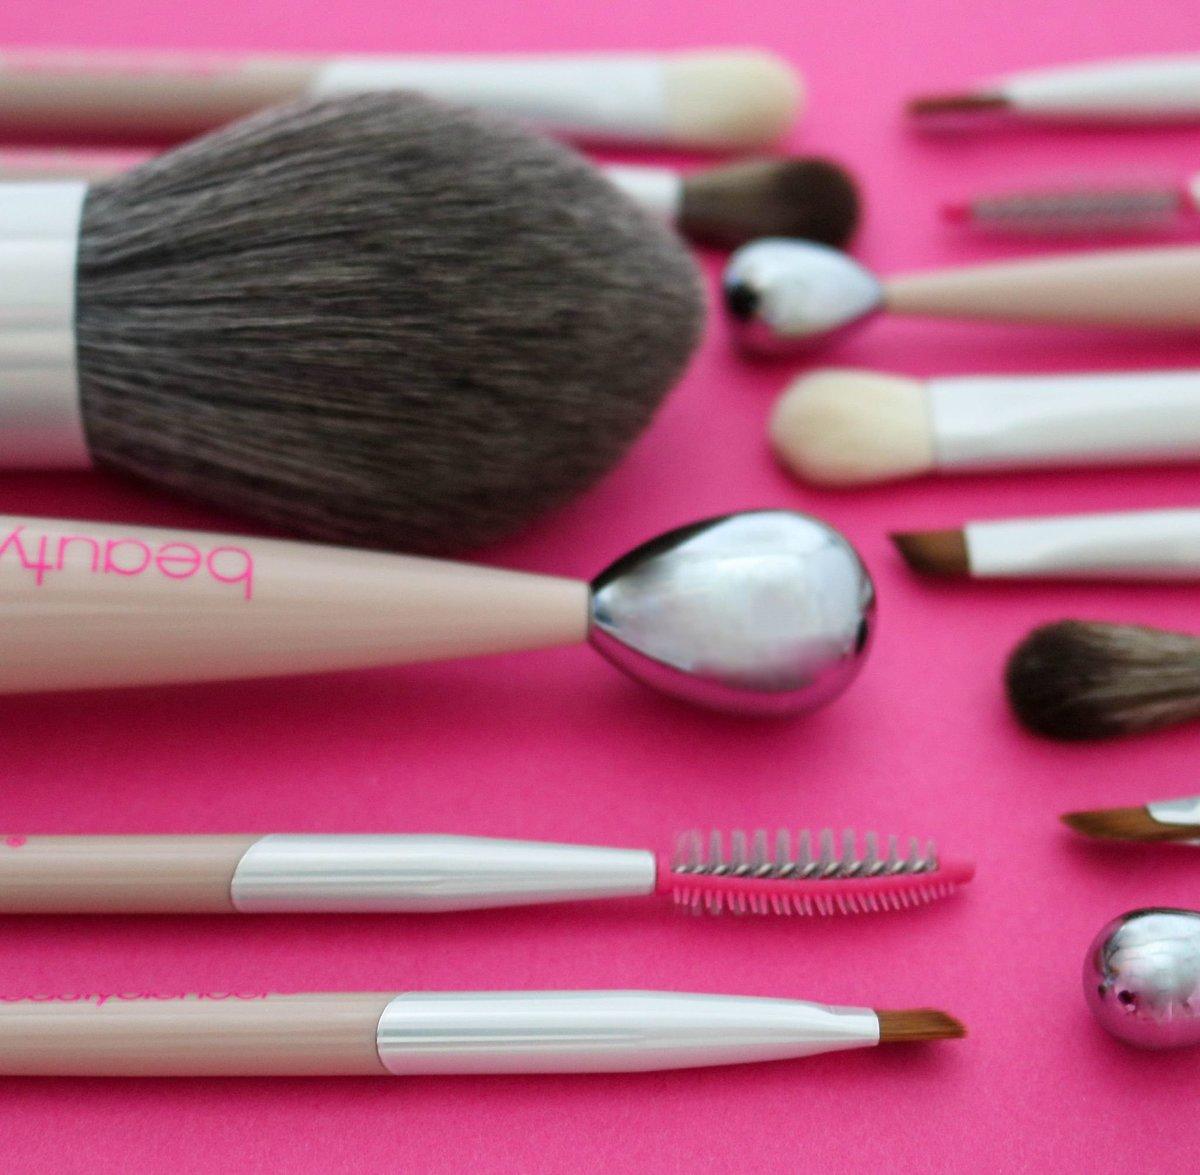 <b>美妆神器正式登场!beautyblender超时尚全新专业完美保养刷具</b>